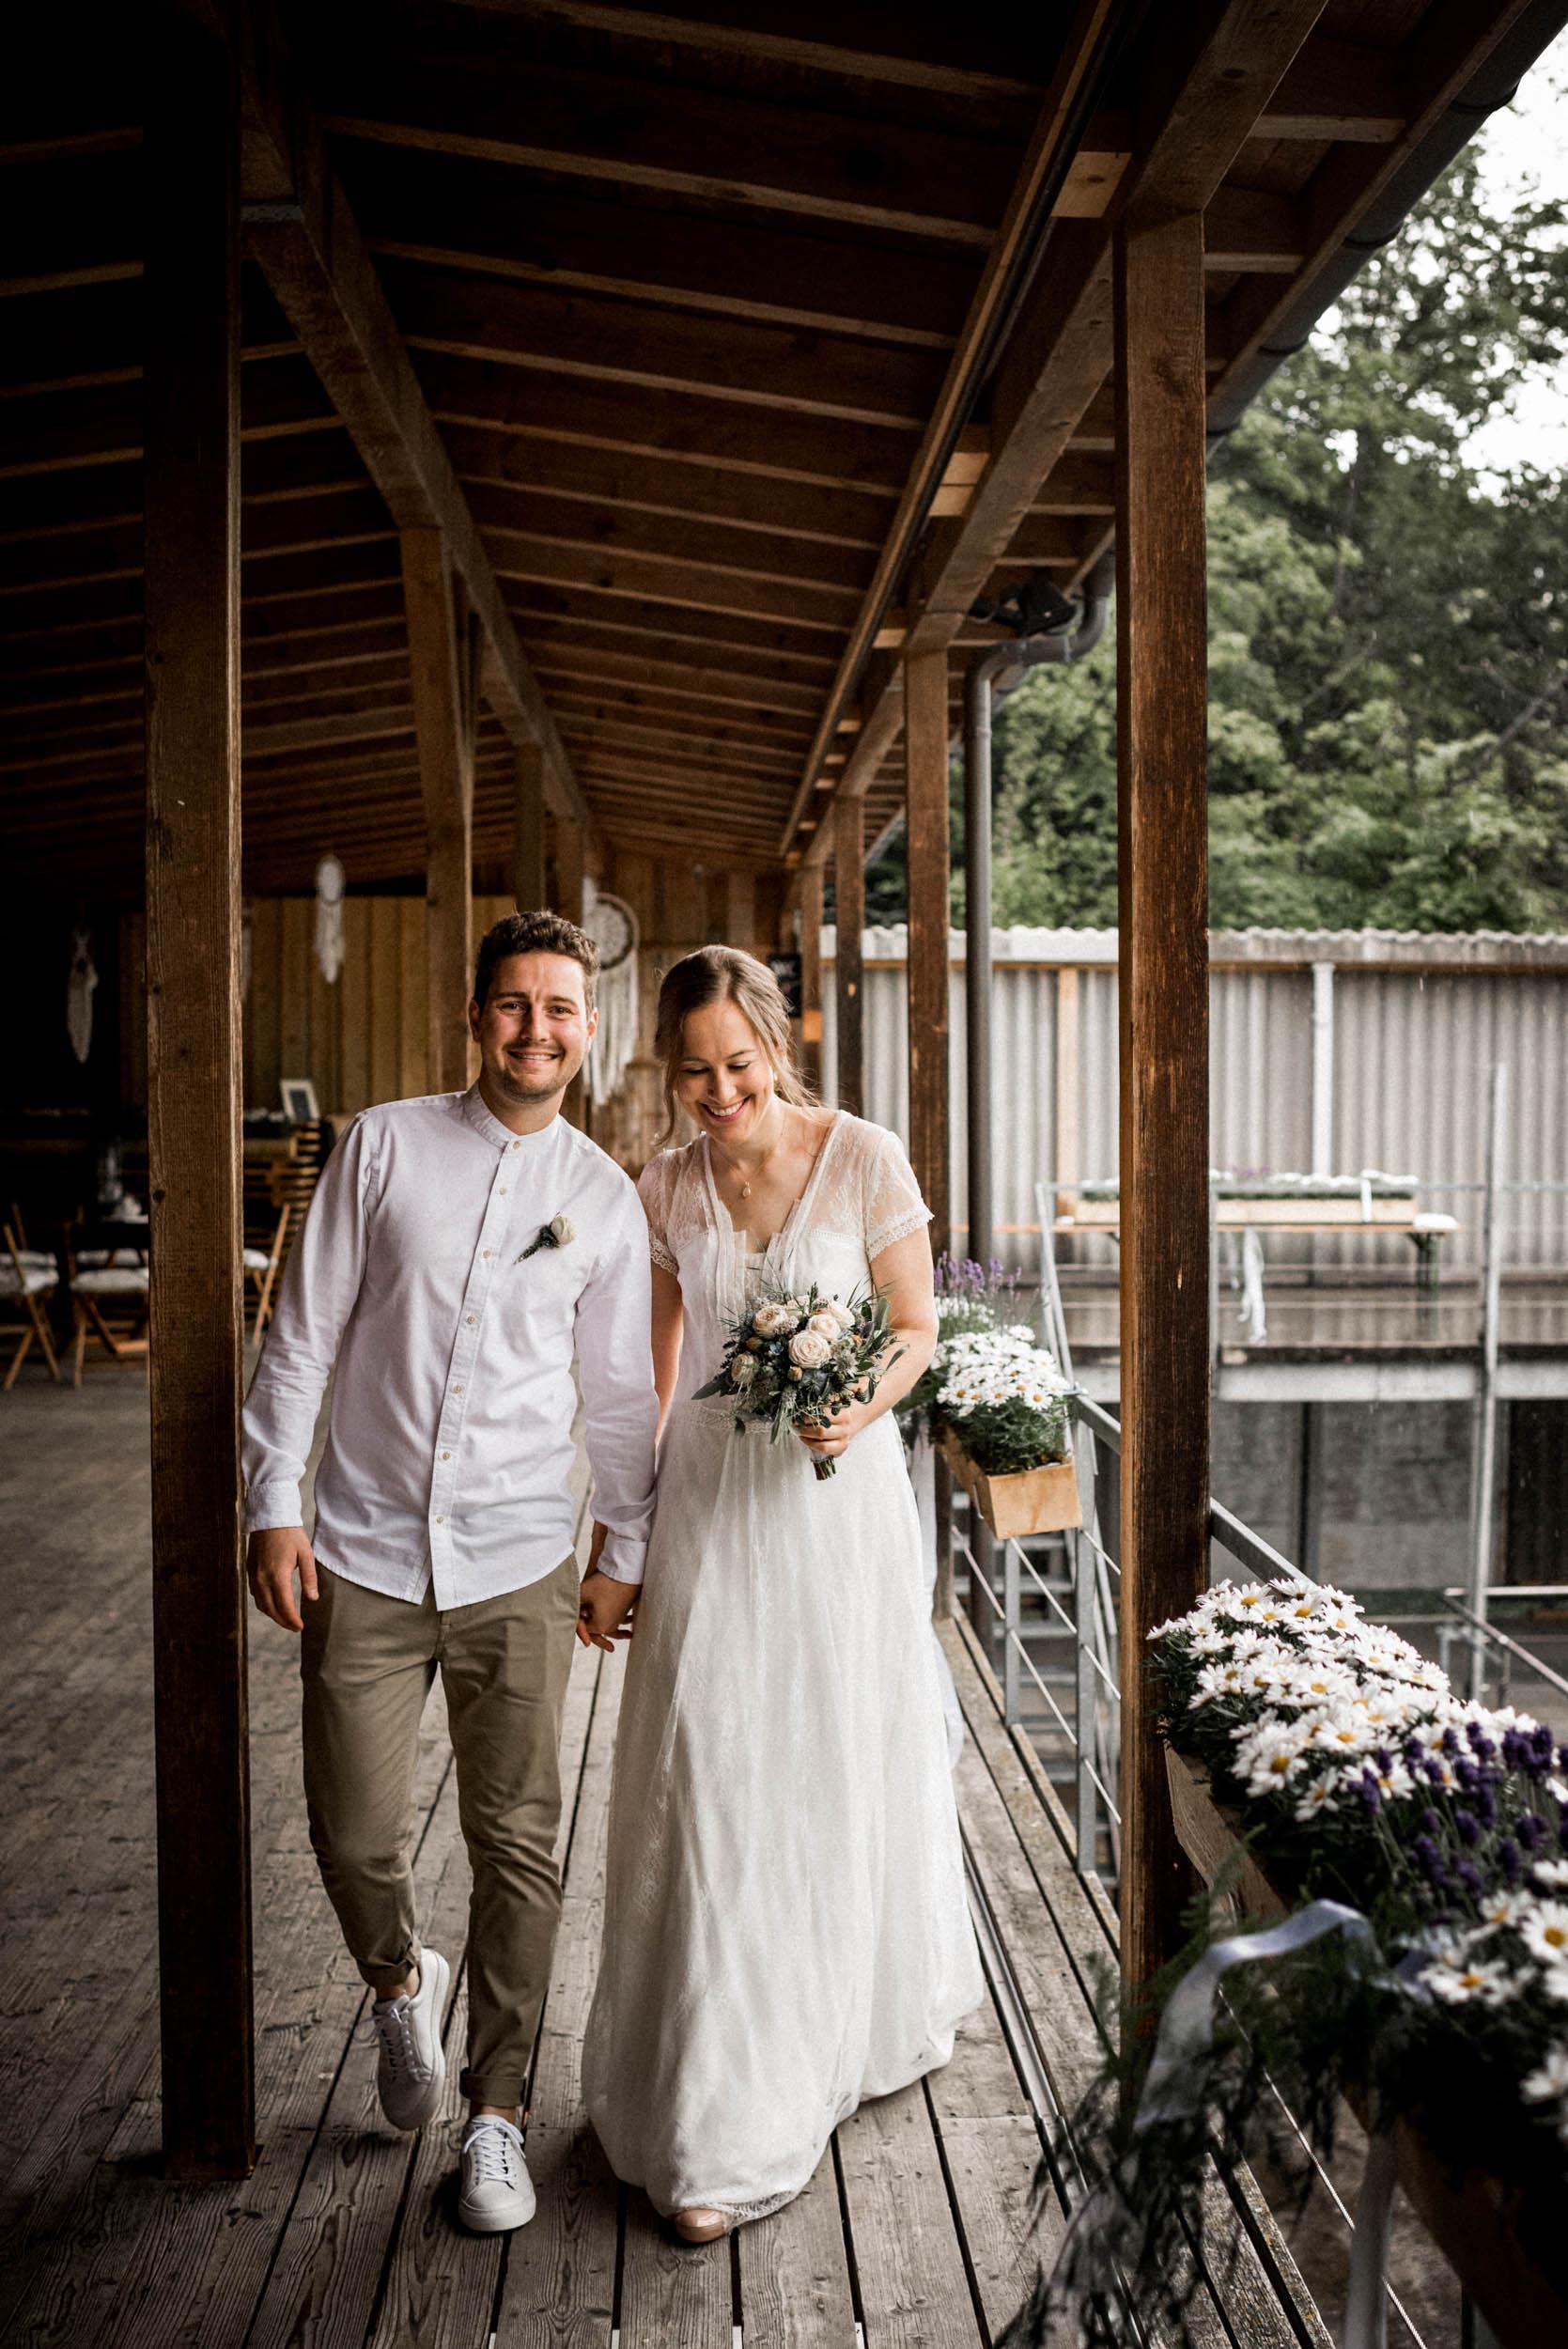 Hochzeitsreportage-Baden-Aargau_2019_1.jpg